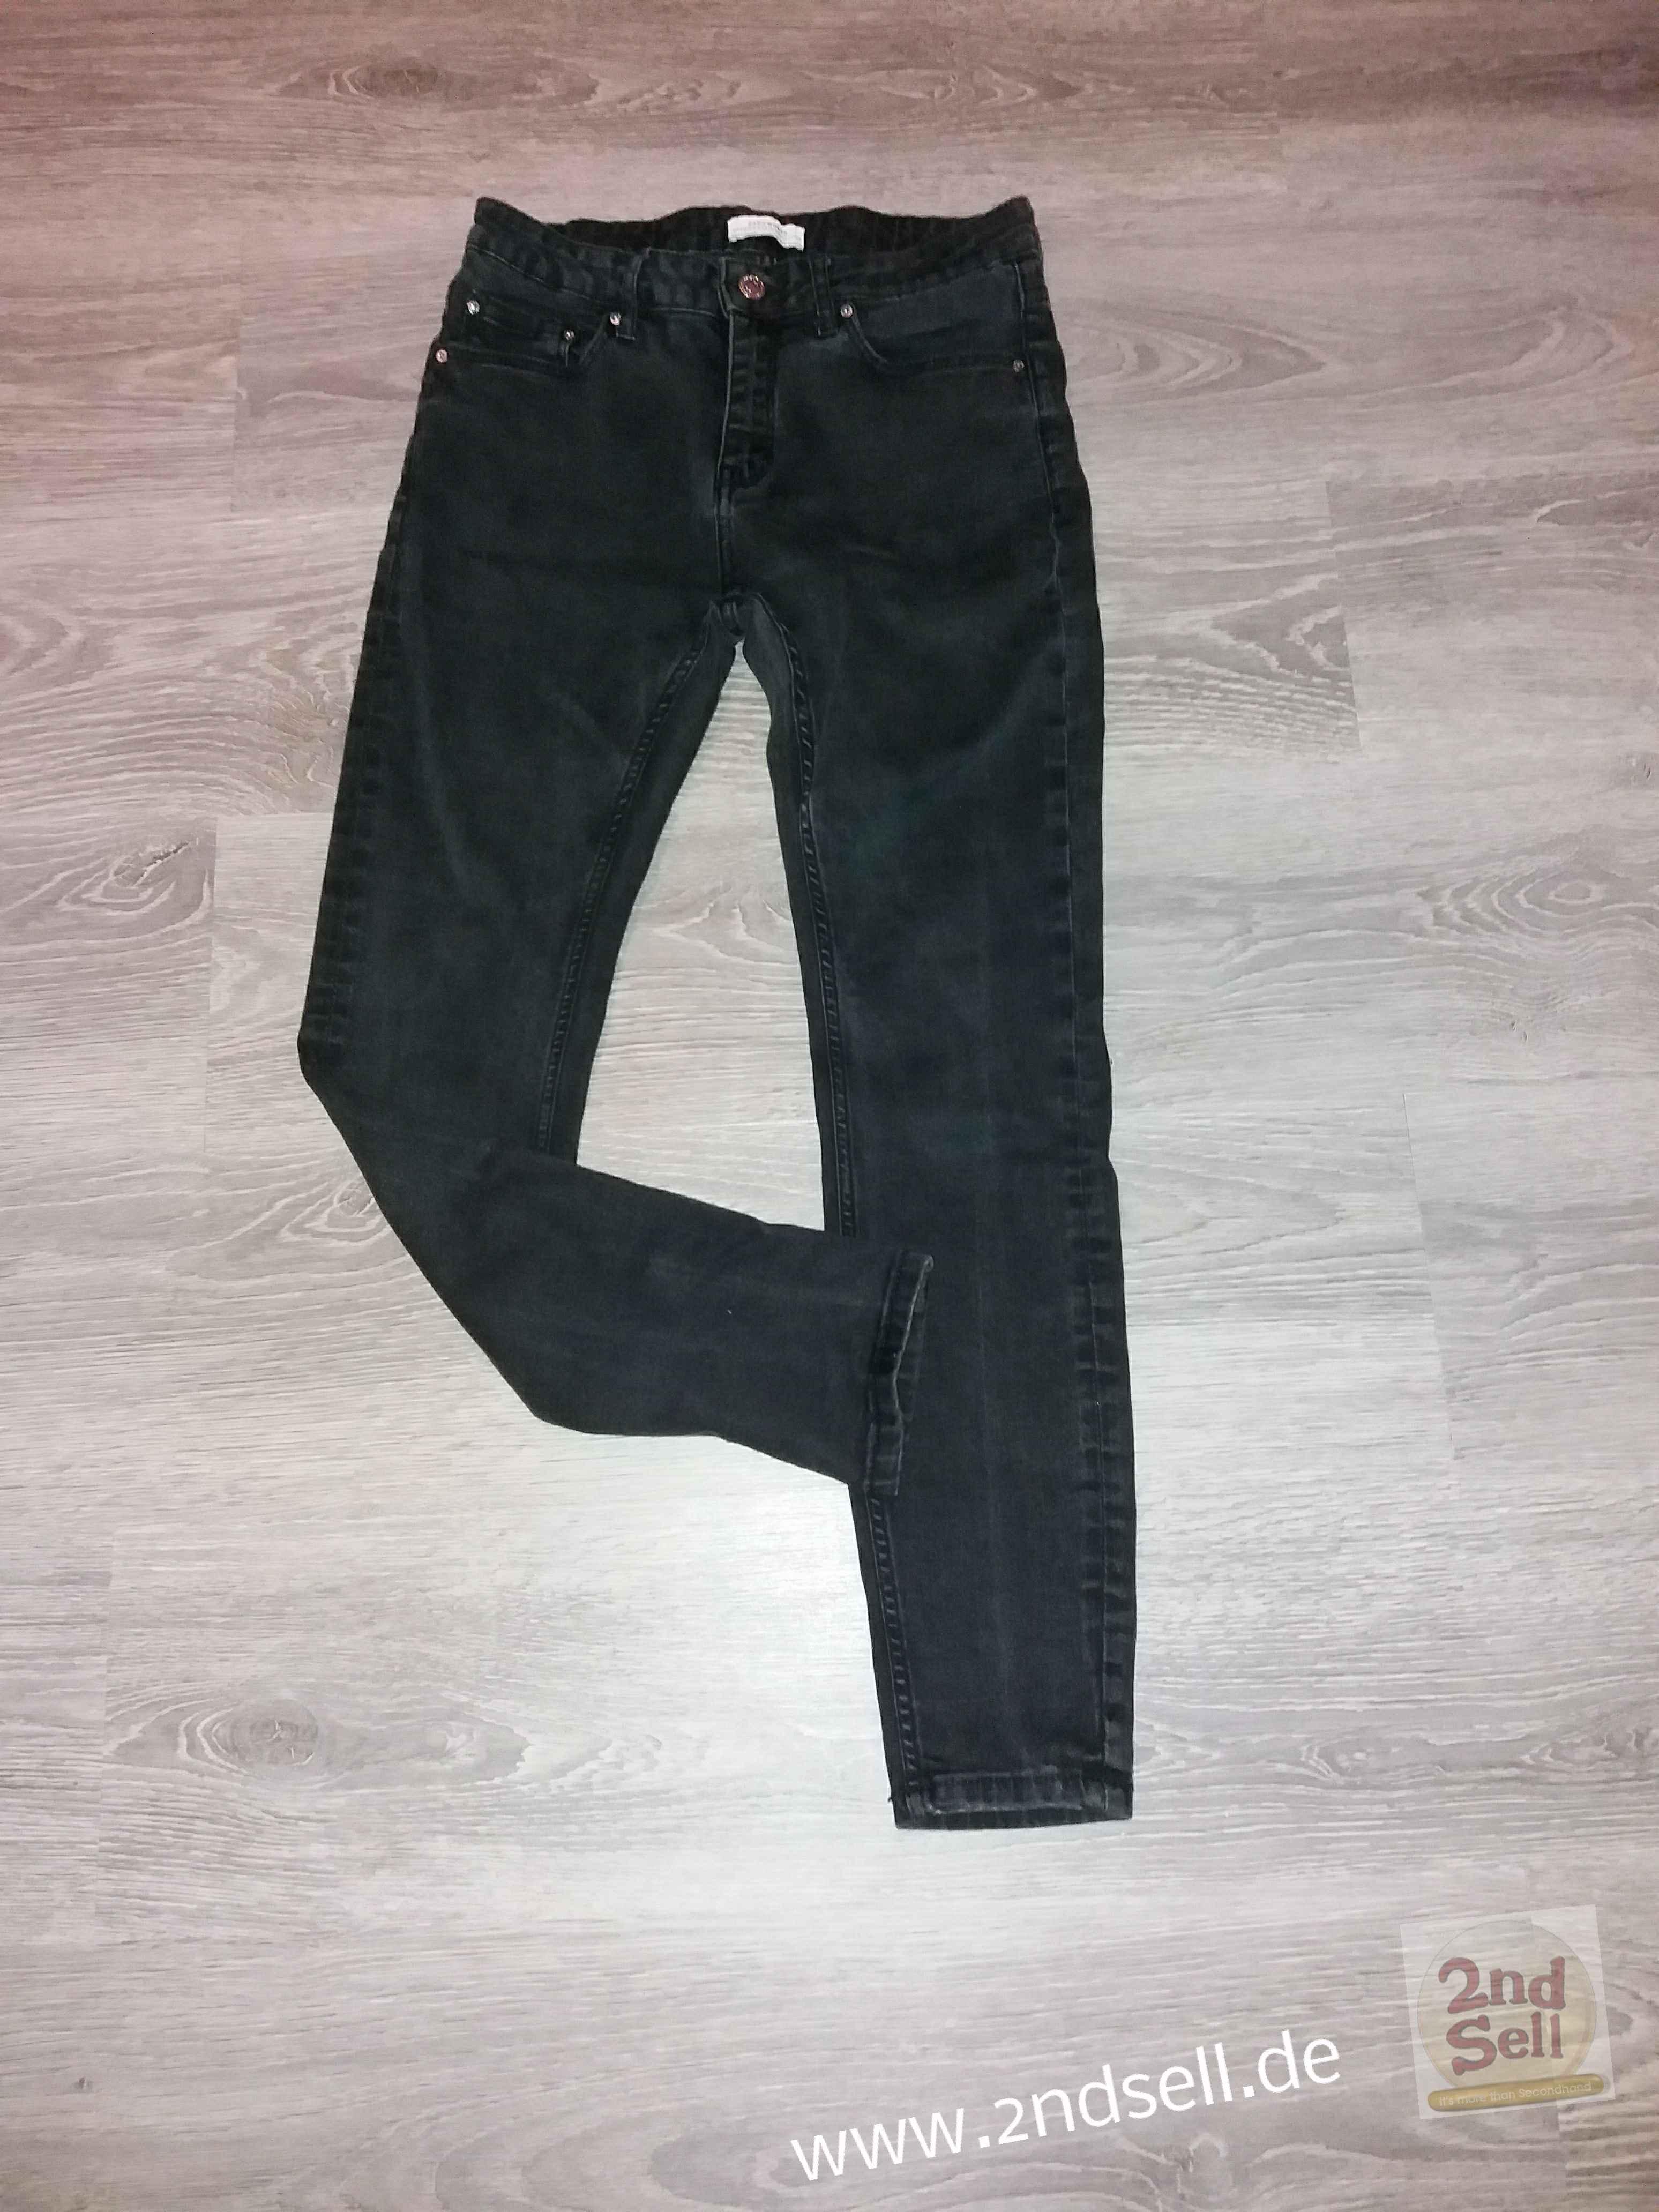 Jeans Zara Gr. 38